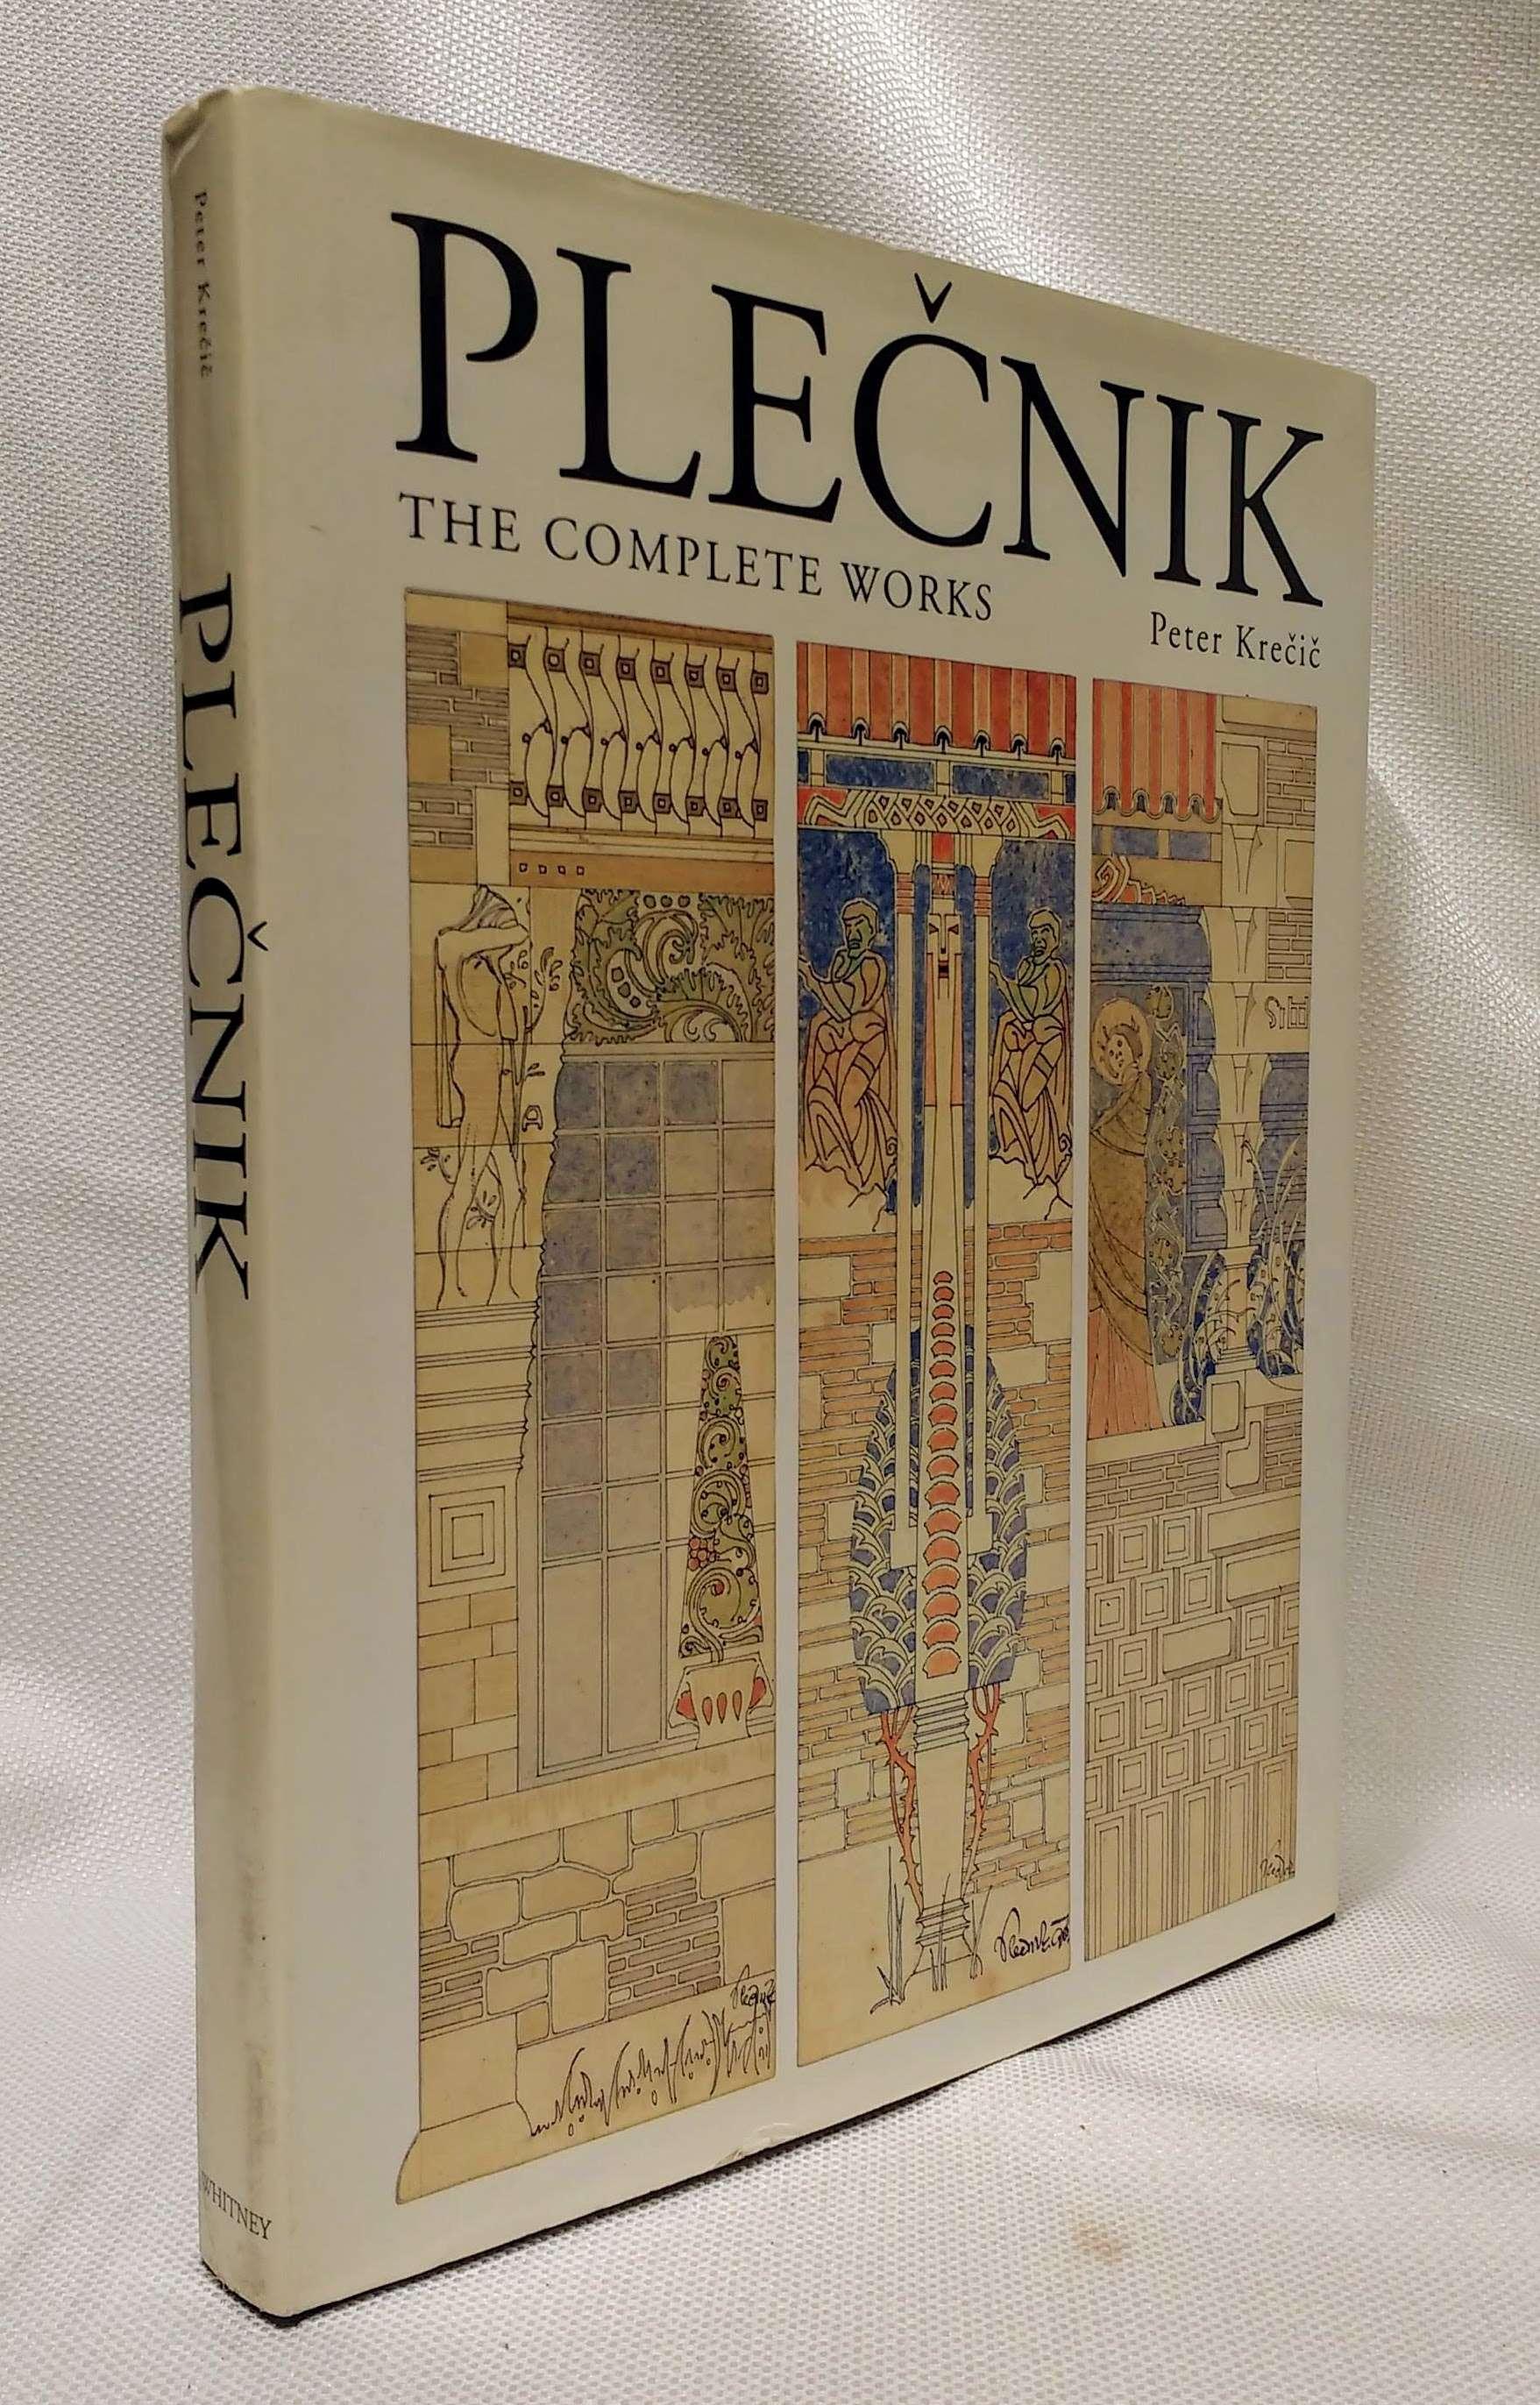 Joze Plecnik [1872-1957]: The Complete Works, Krecic, Peter